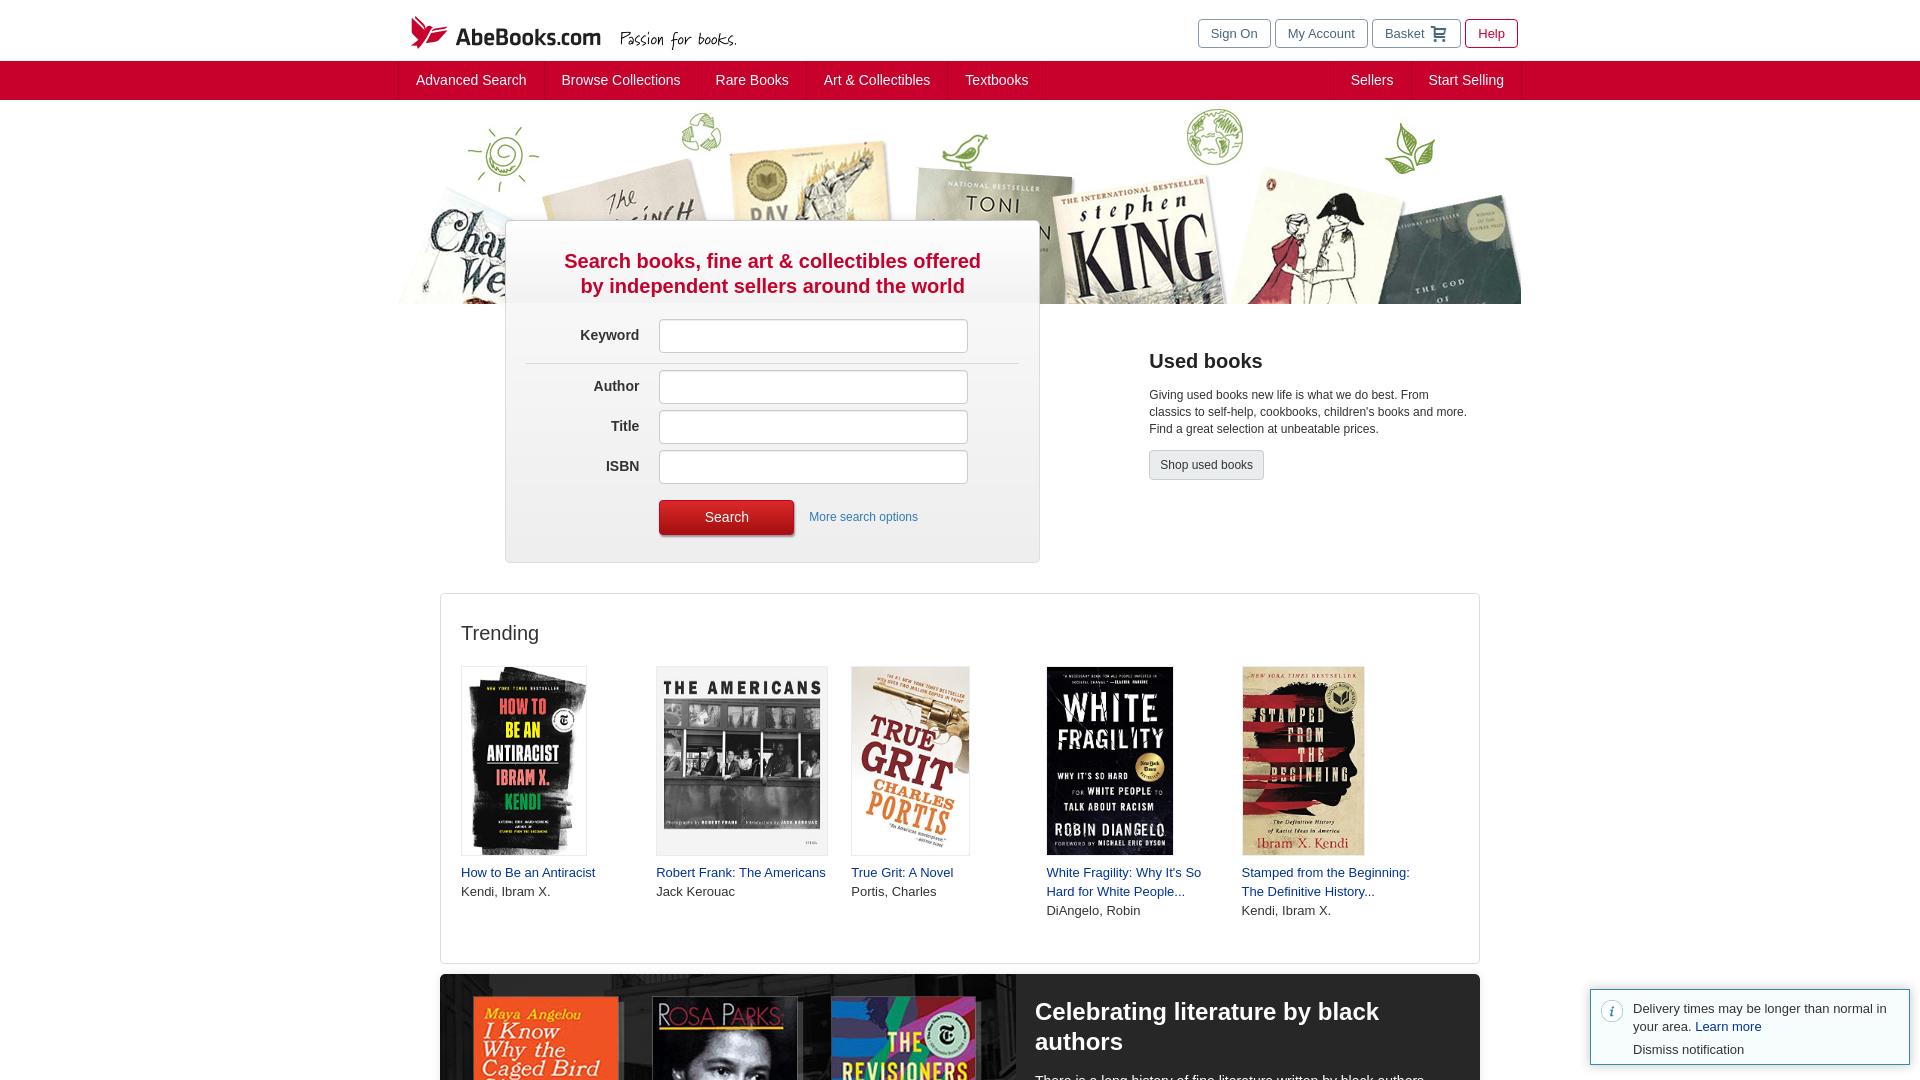 AbeBooks website